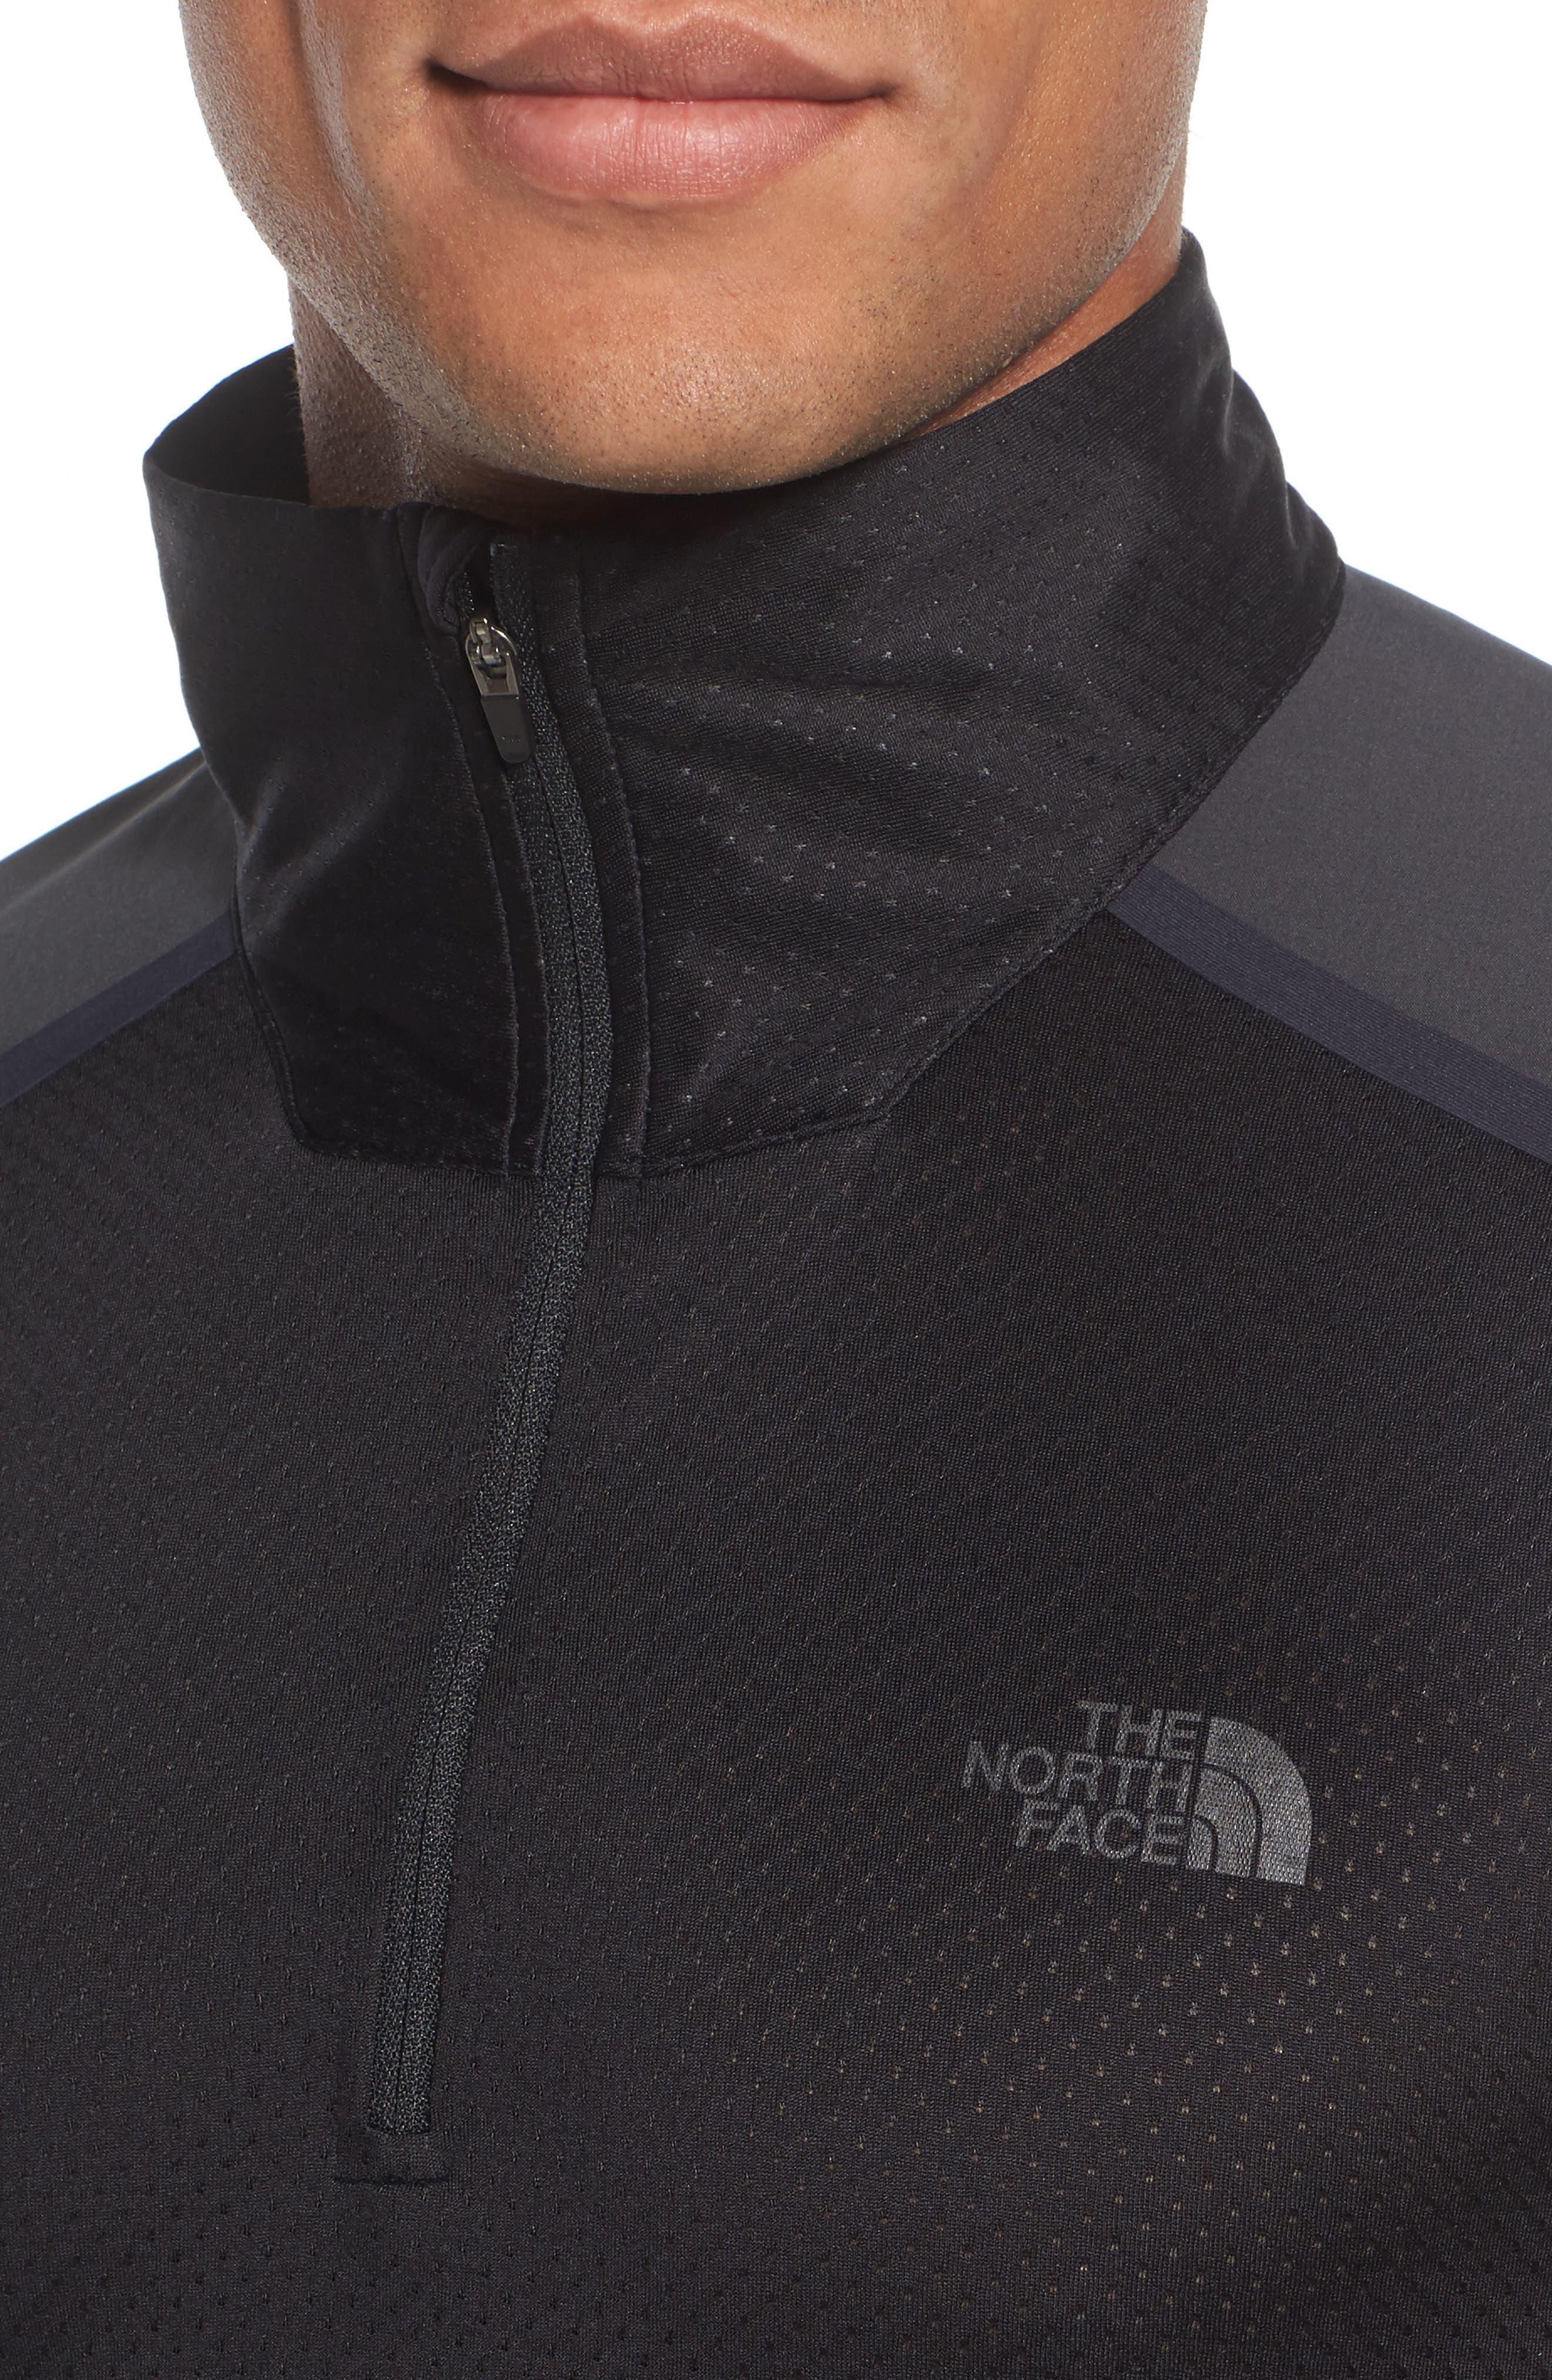 Alternate Image 4  - The North Face 'Kilowatt' Quarter Zip Training Pullover